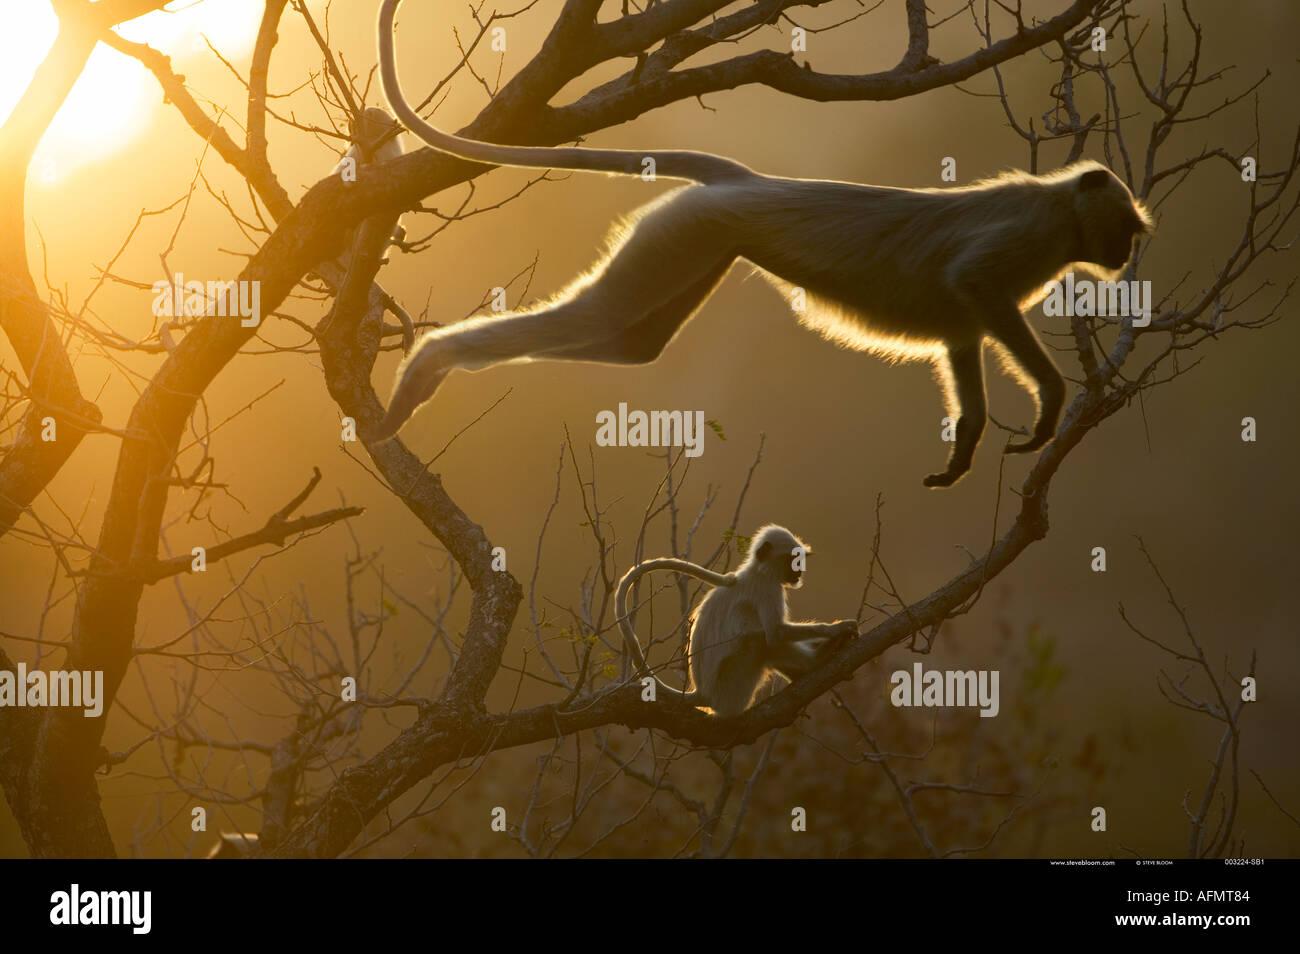 Hanuman-Languren springen durch die Baumwipfel Bandhavgarh Indien Stockfoto